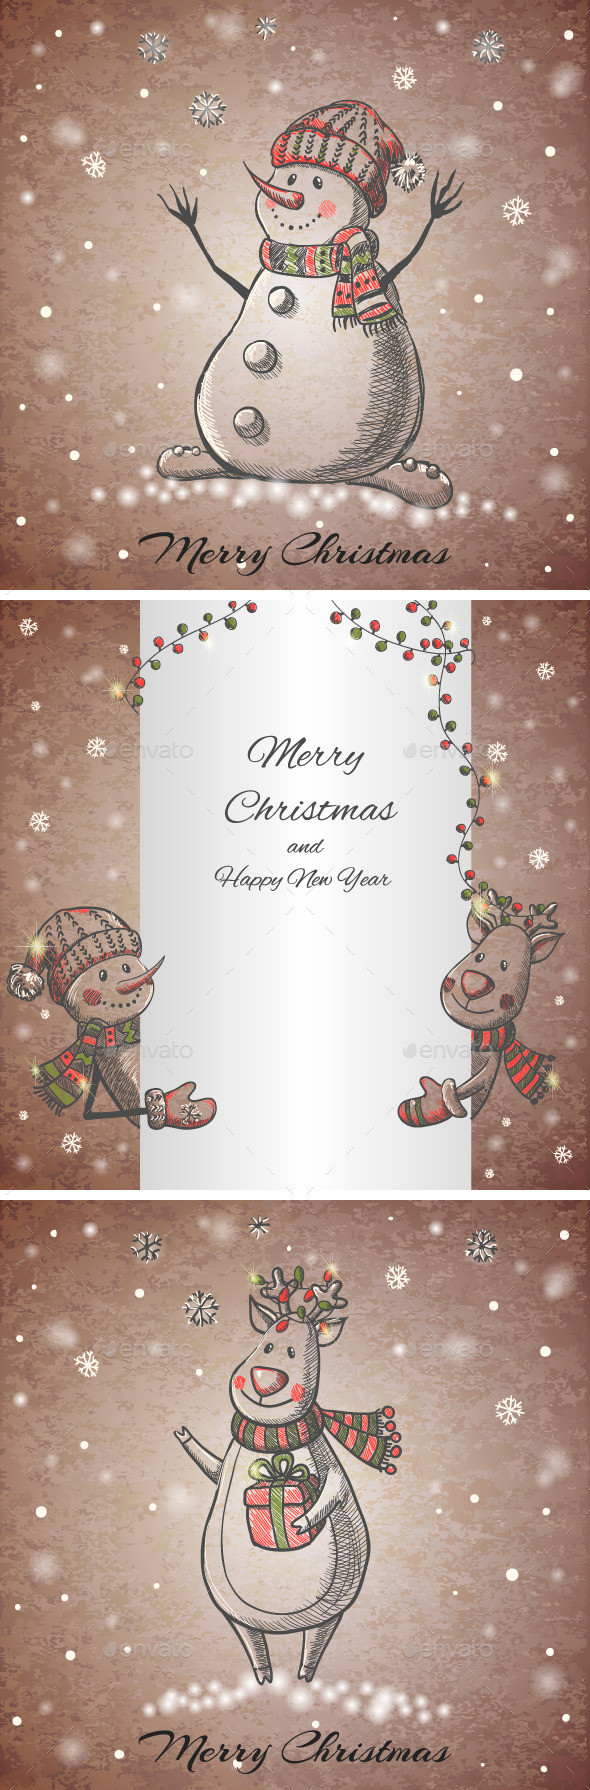 Set of Three Hand Drawn Christmas Cards - Christmas Seasons/Holidays